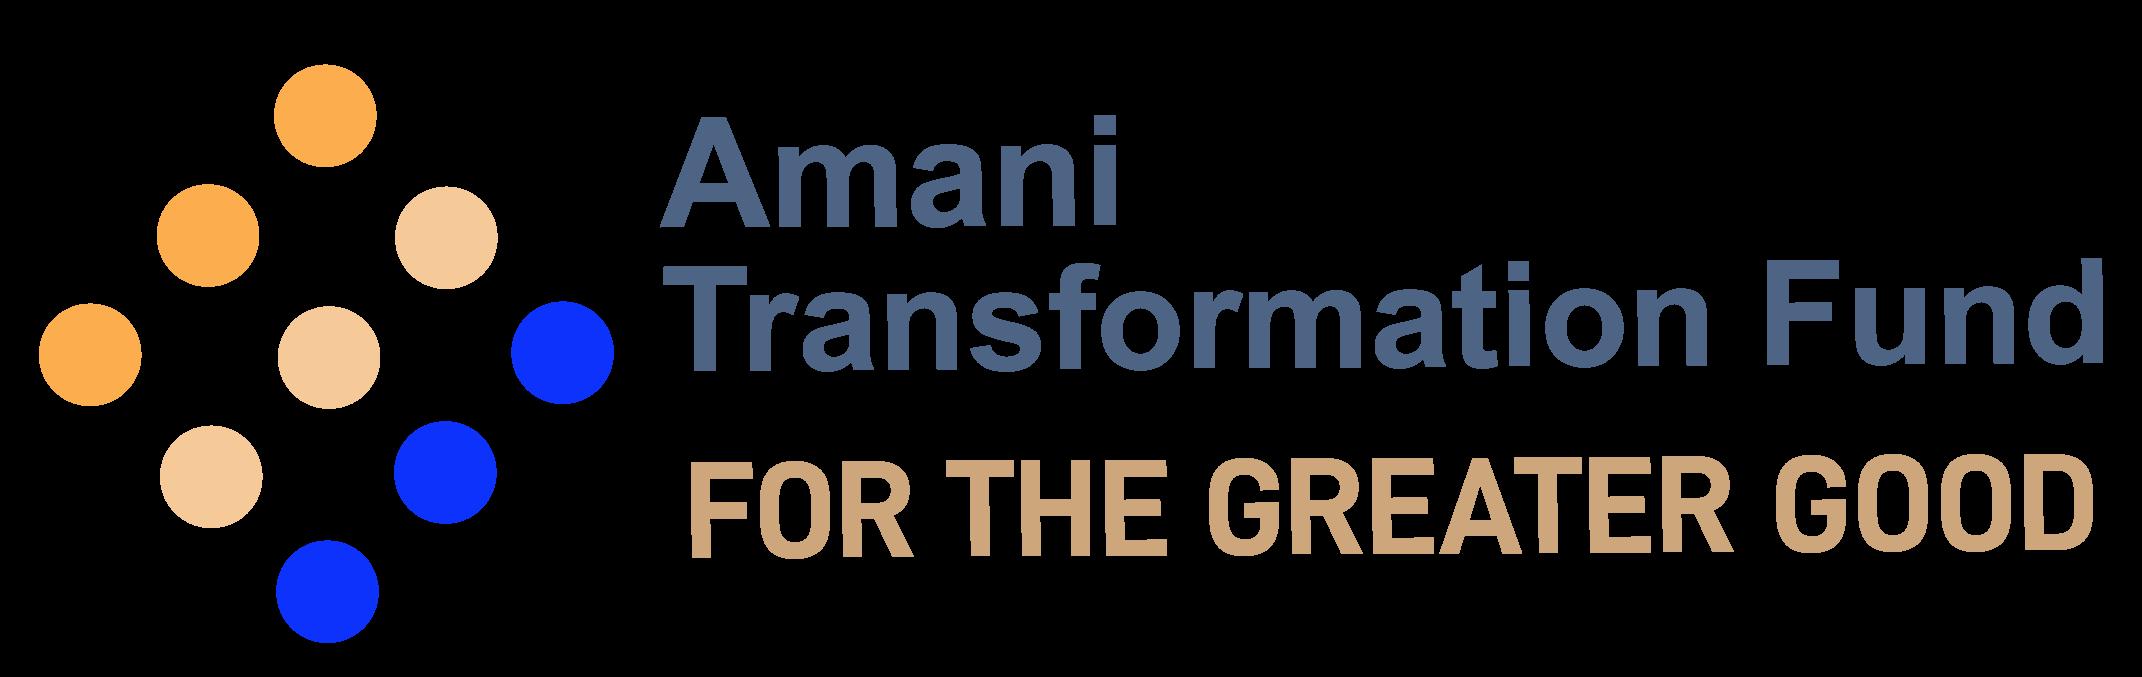 Amani Transformation Fund